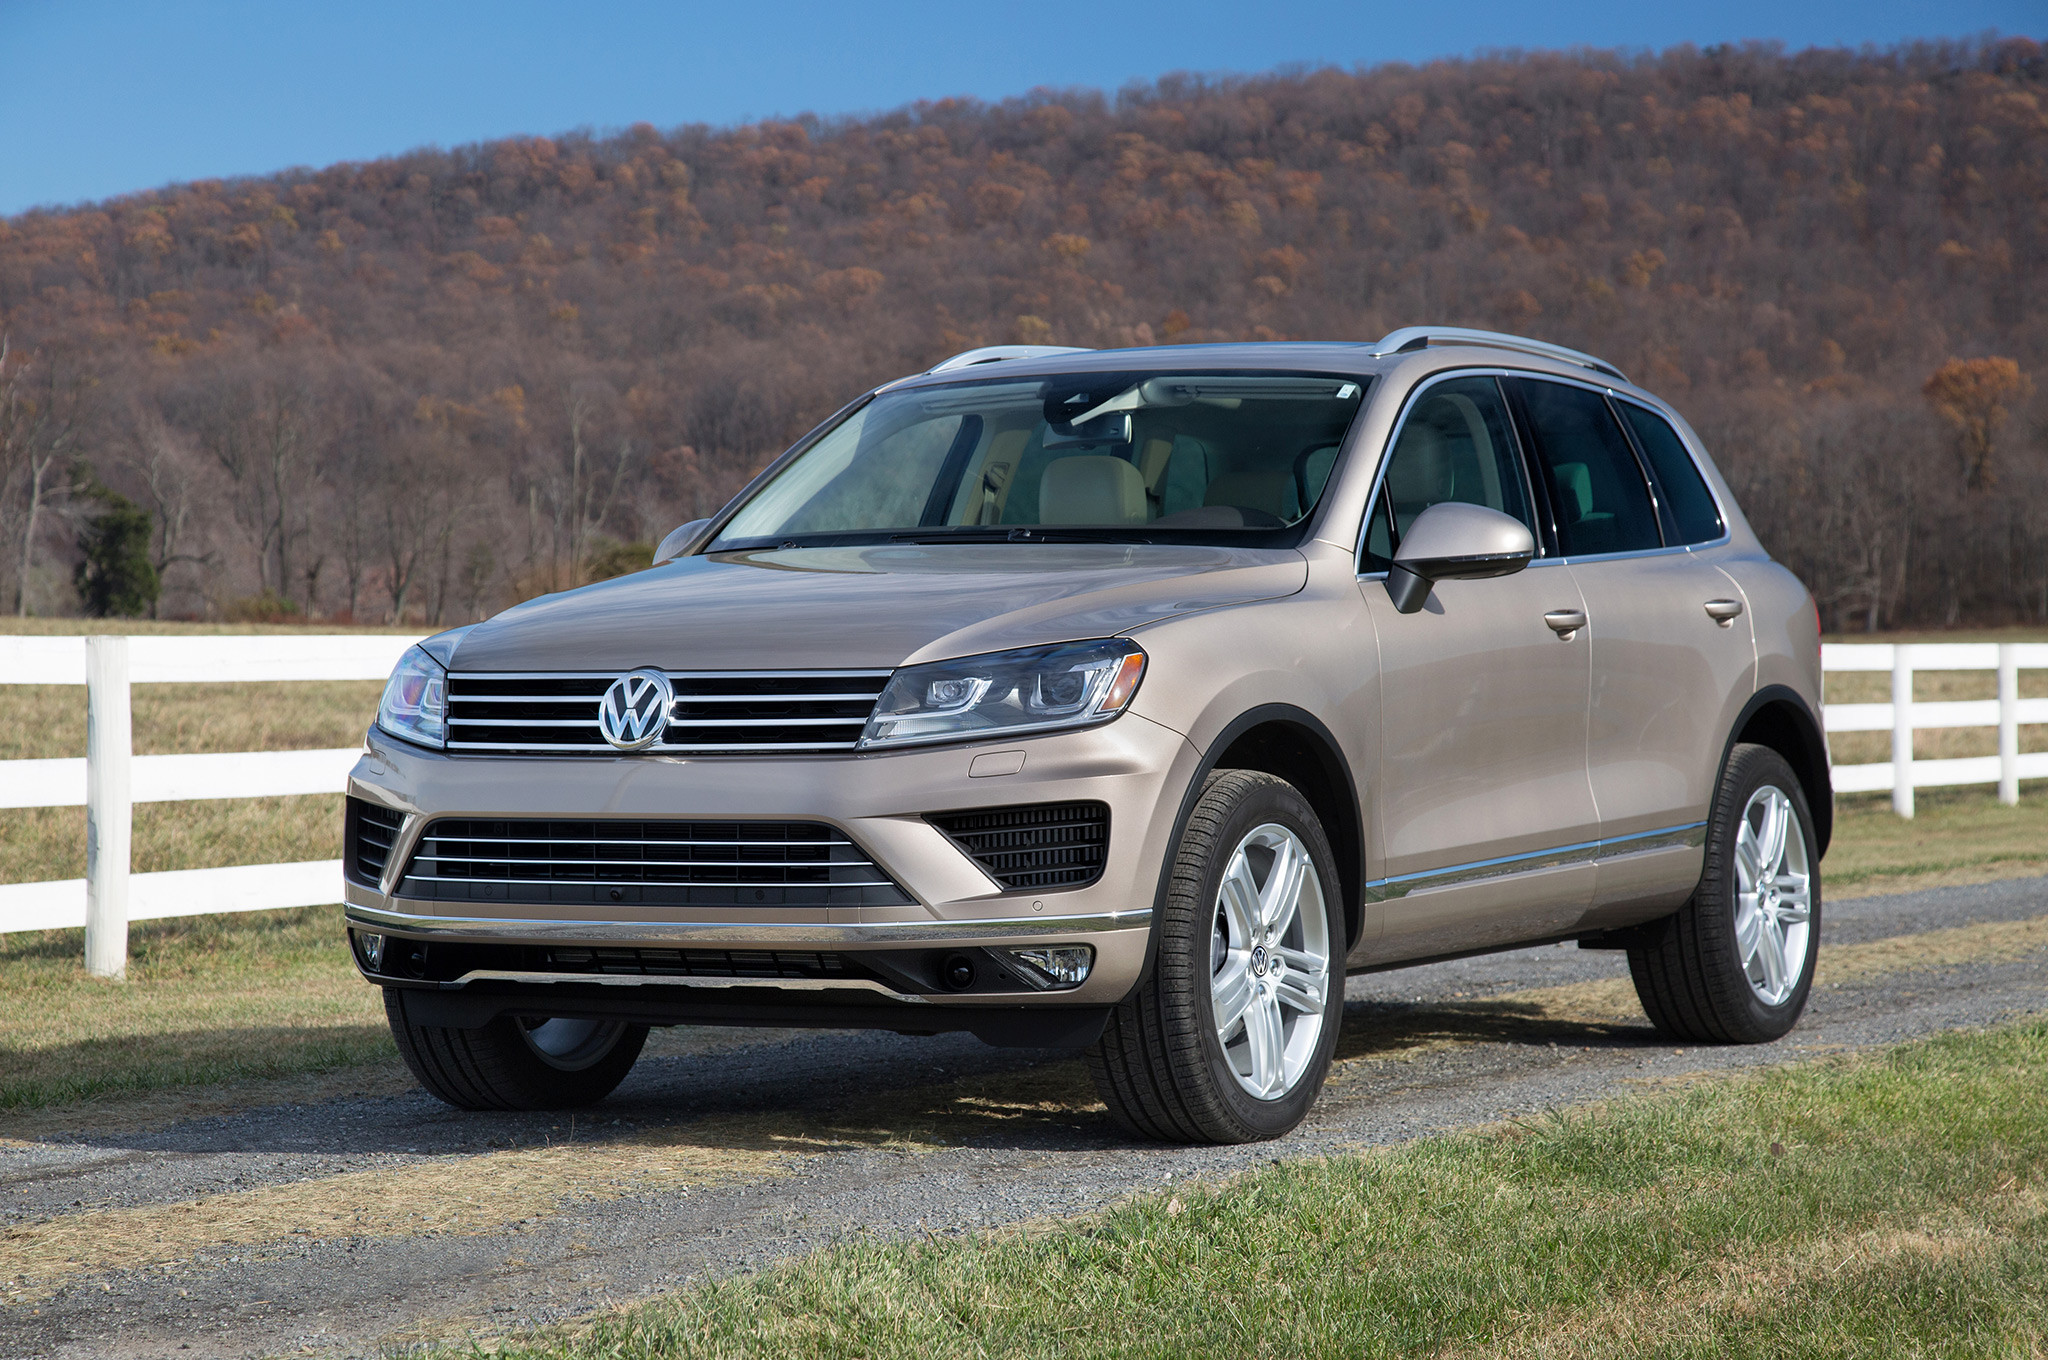 VW закончил сборку джипа Touareg вКалуге